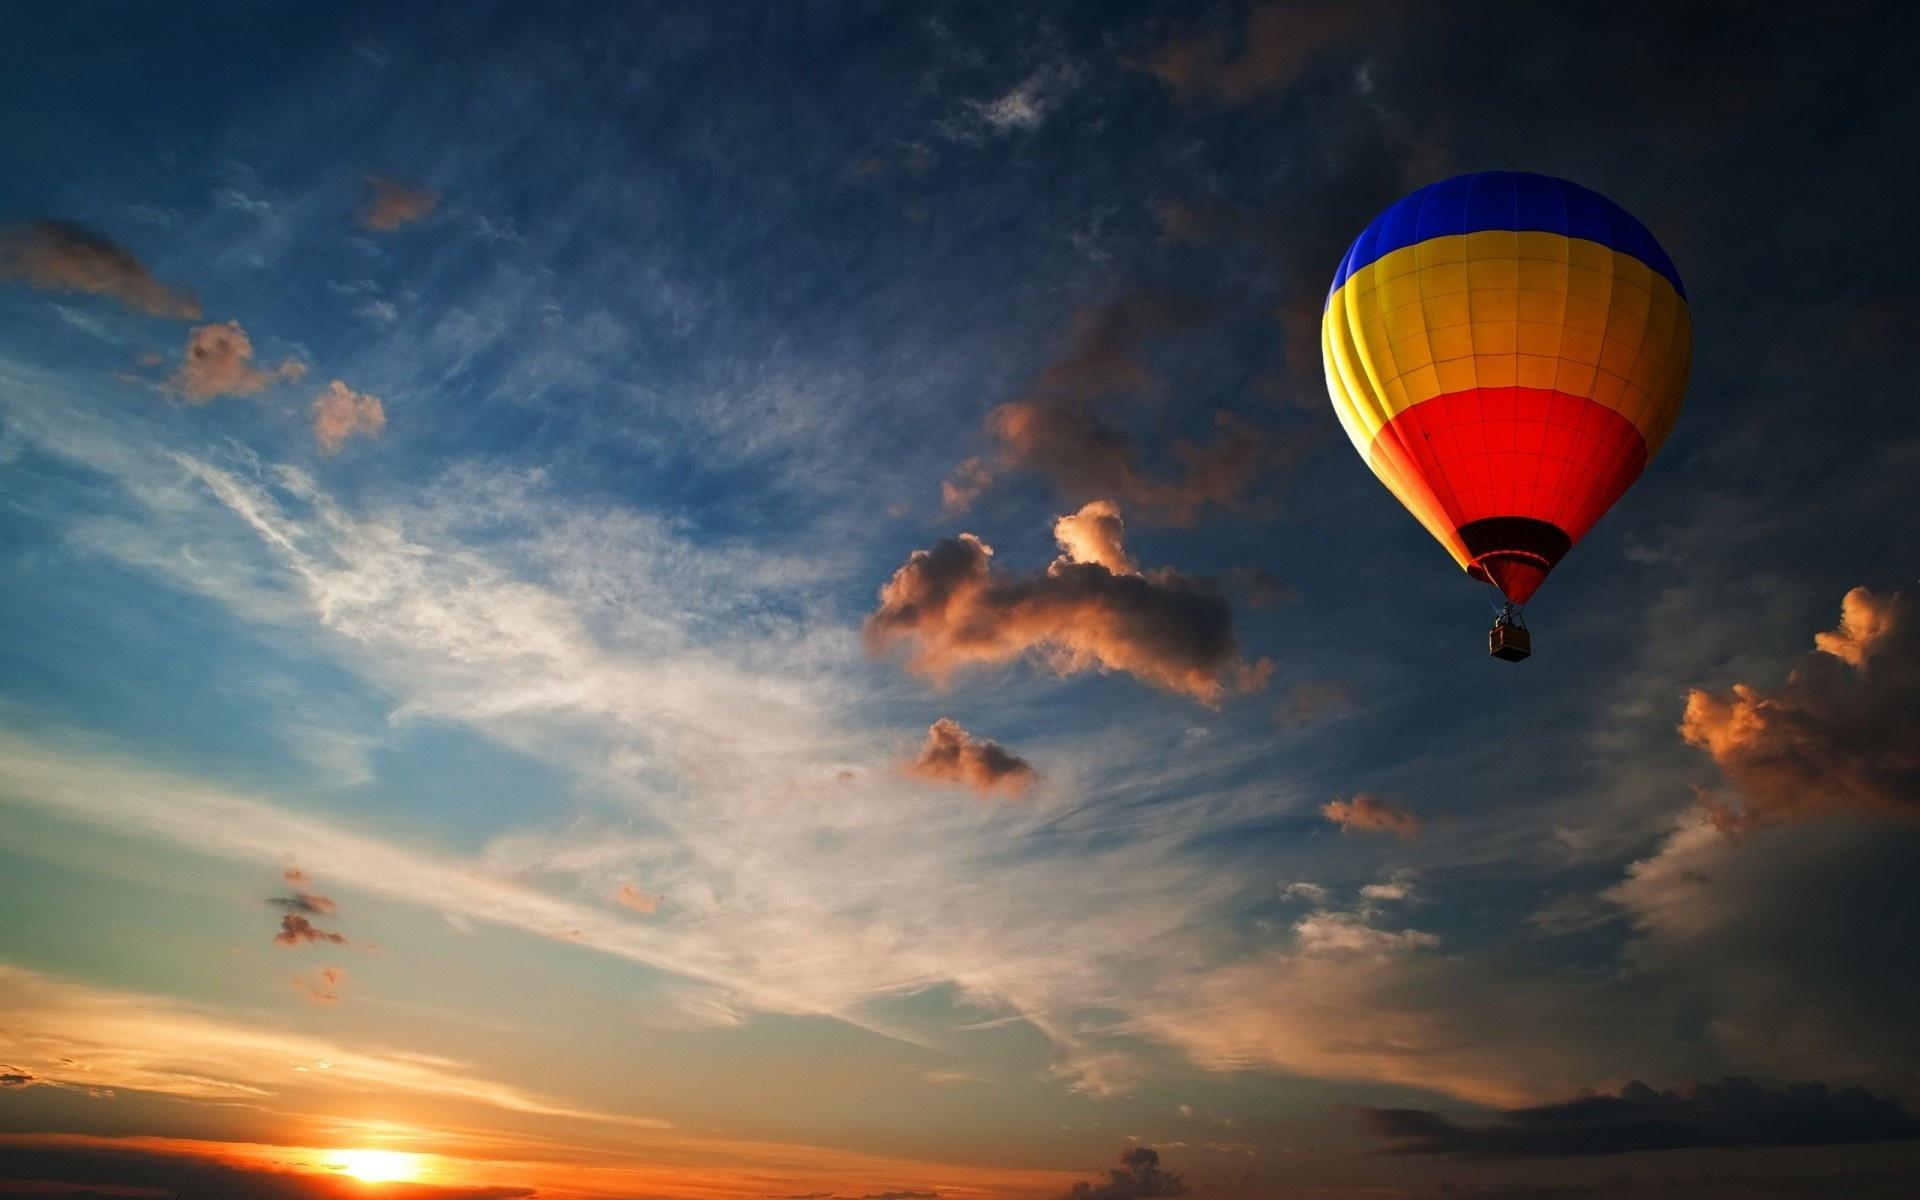 montgolfiere wallpaper